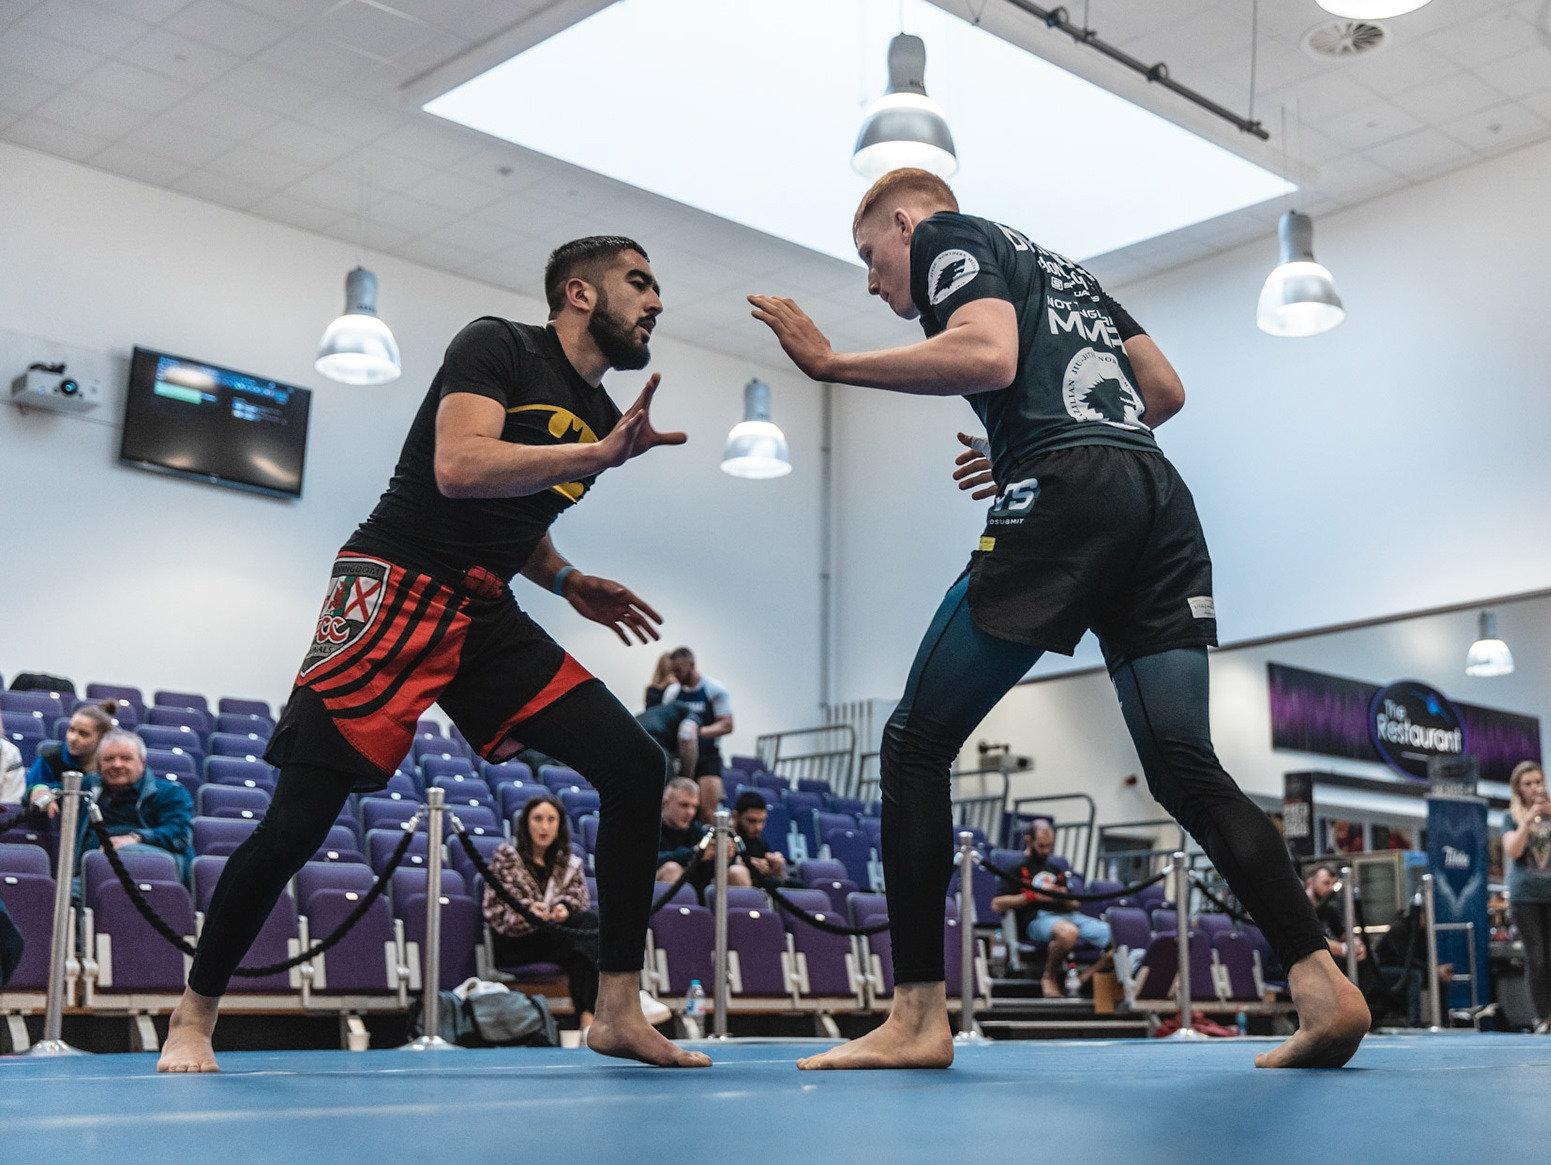 MMA Wrestling